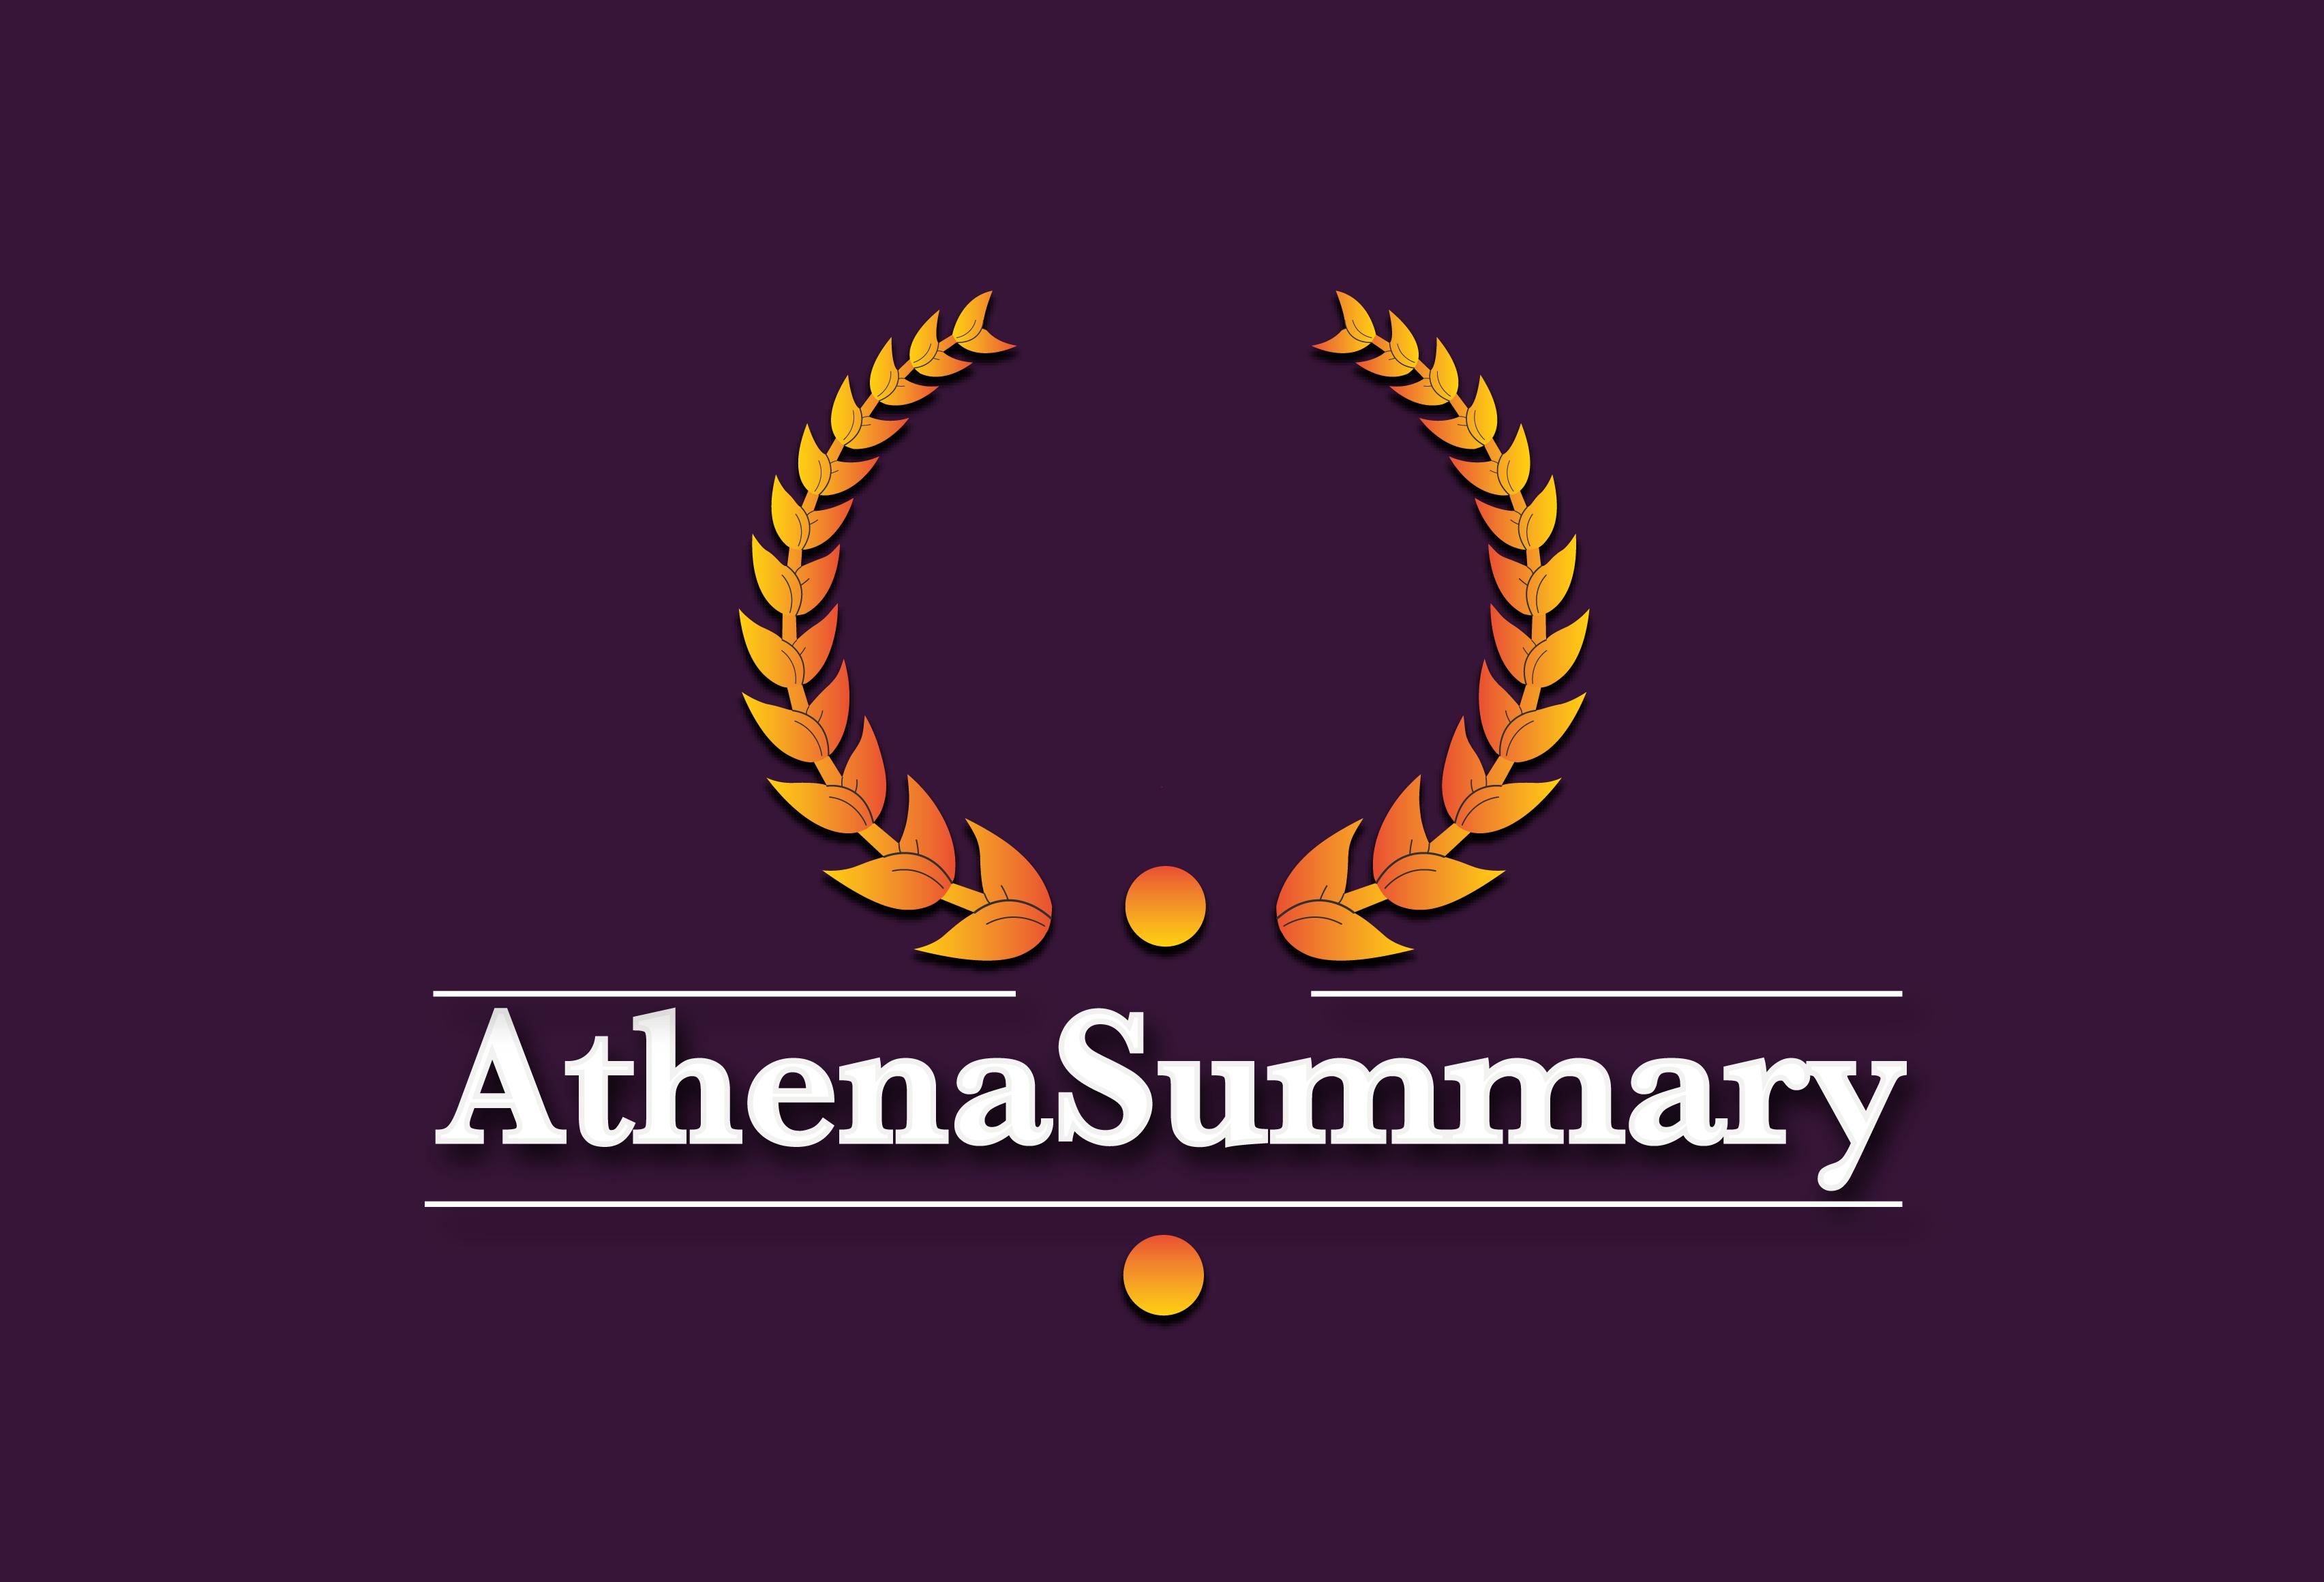 AthenaSummary